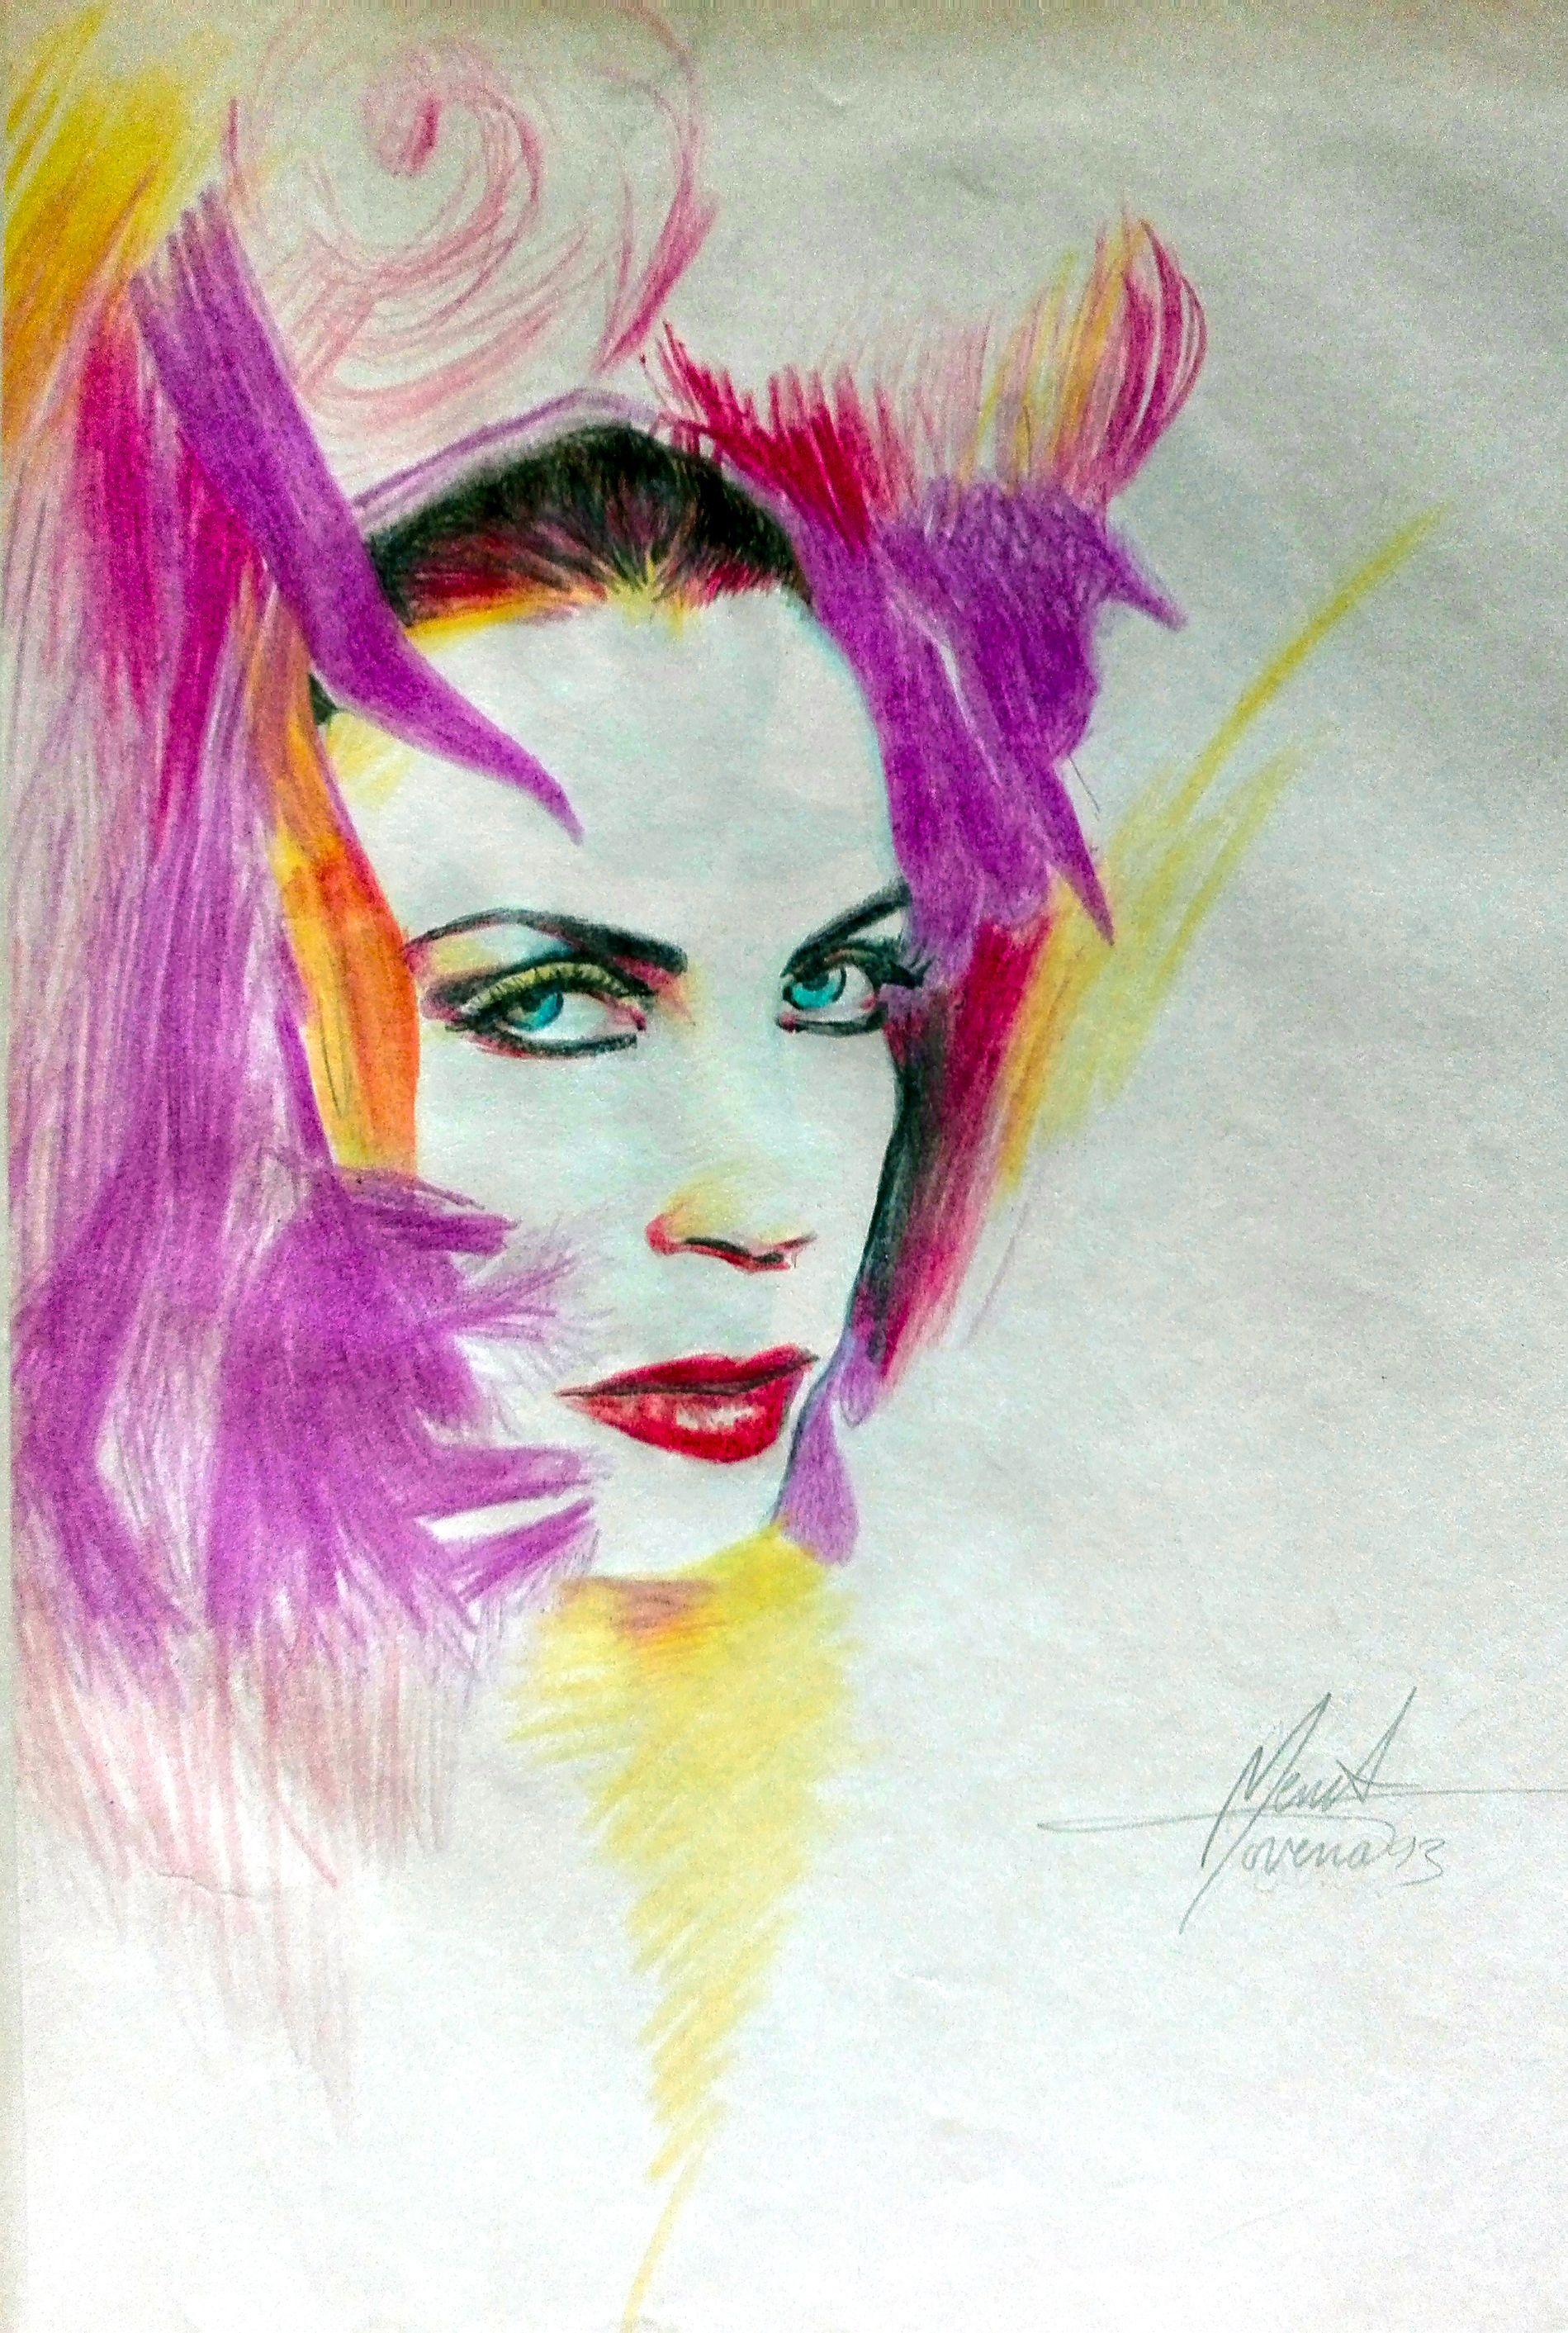 Annie lennox diva drawing art portrait retrato dibujo arte art art interview artists magazine - Annie lennox diva ...